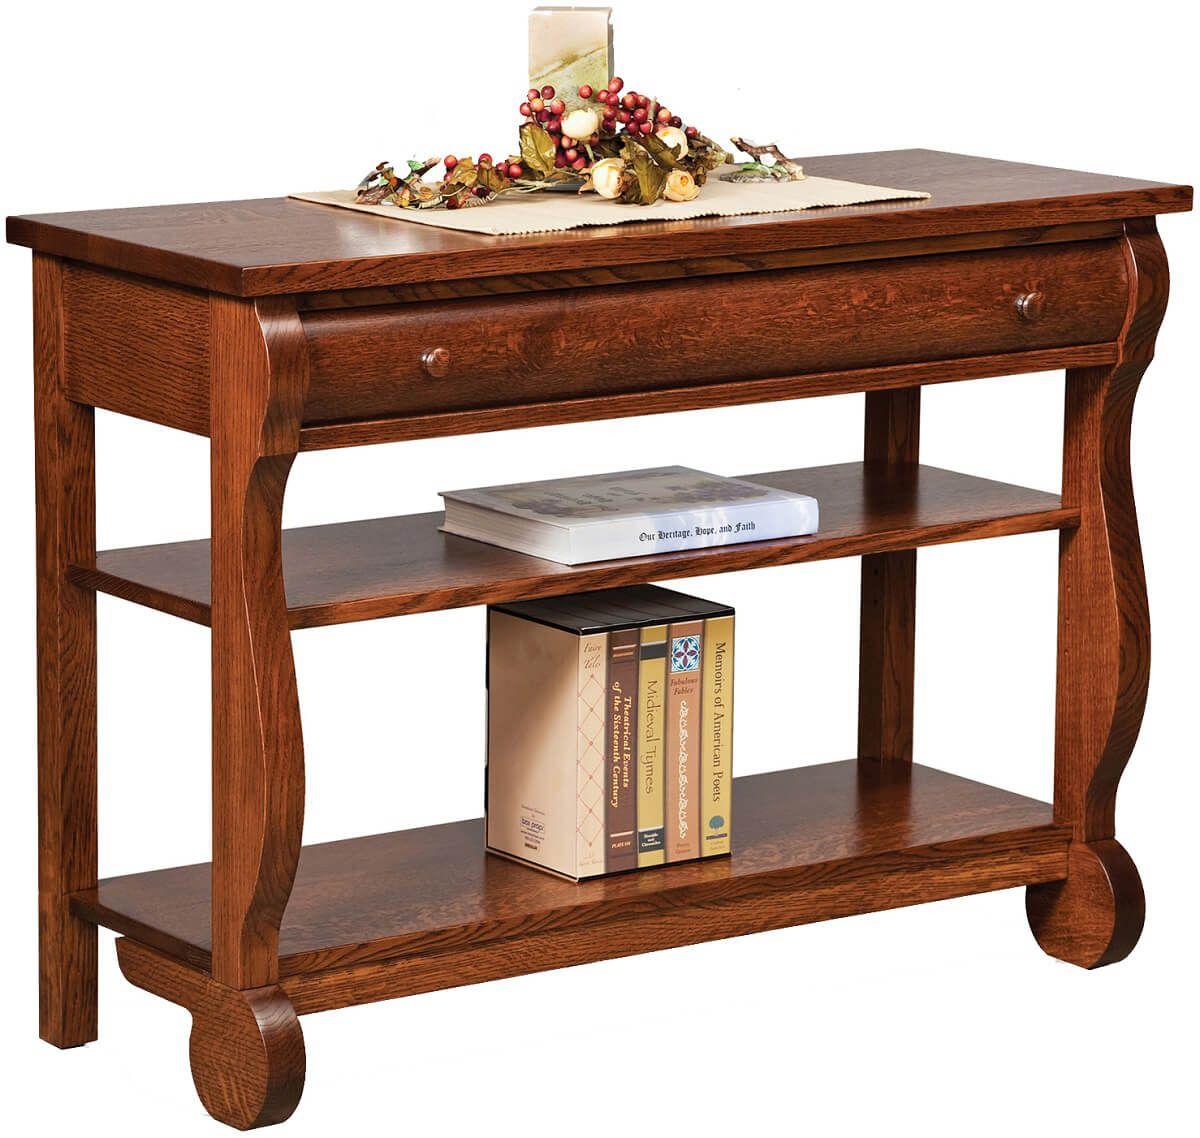 amish built sofa tables mirror half moon demilune console table wyndlot sleigh open countryside